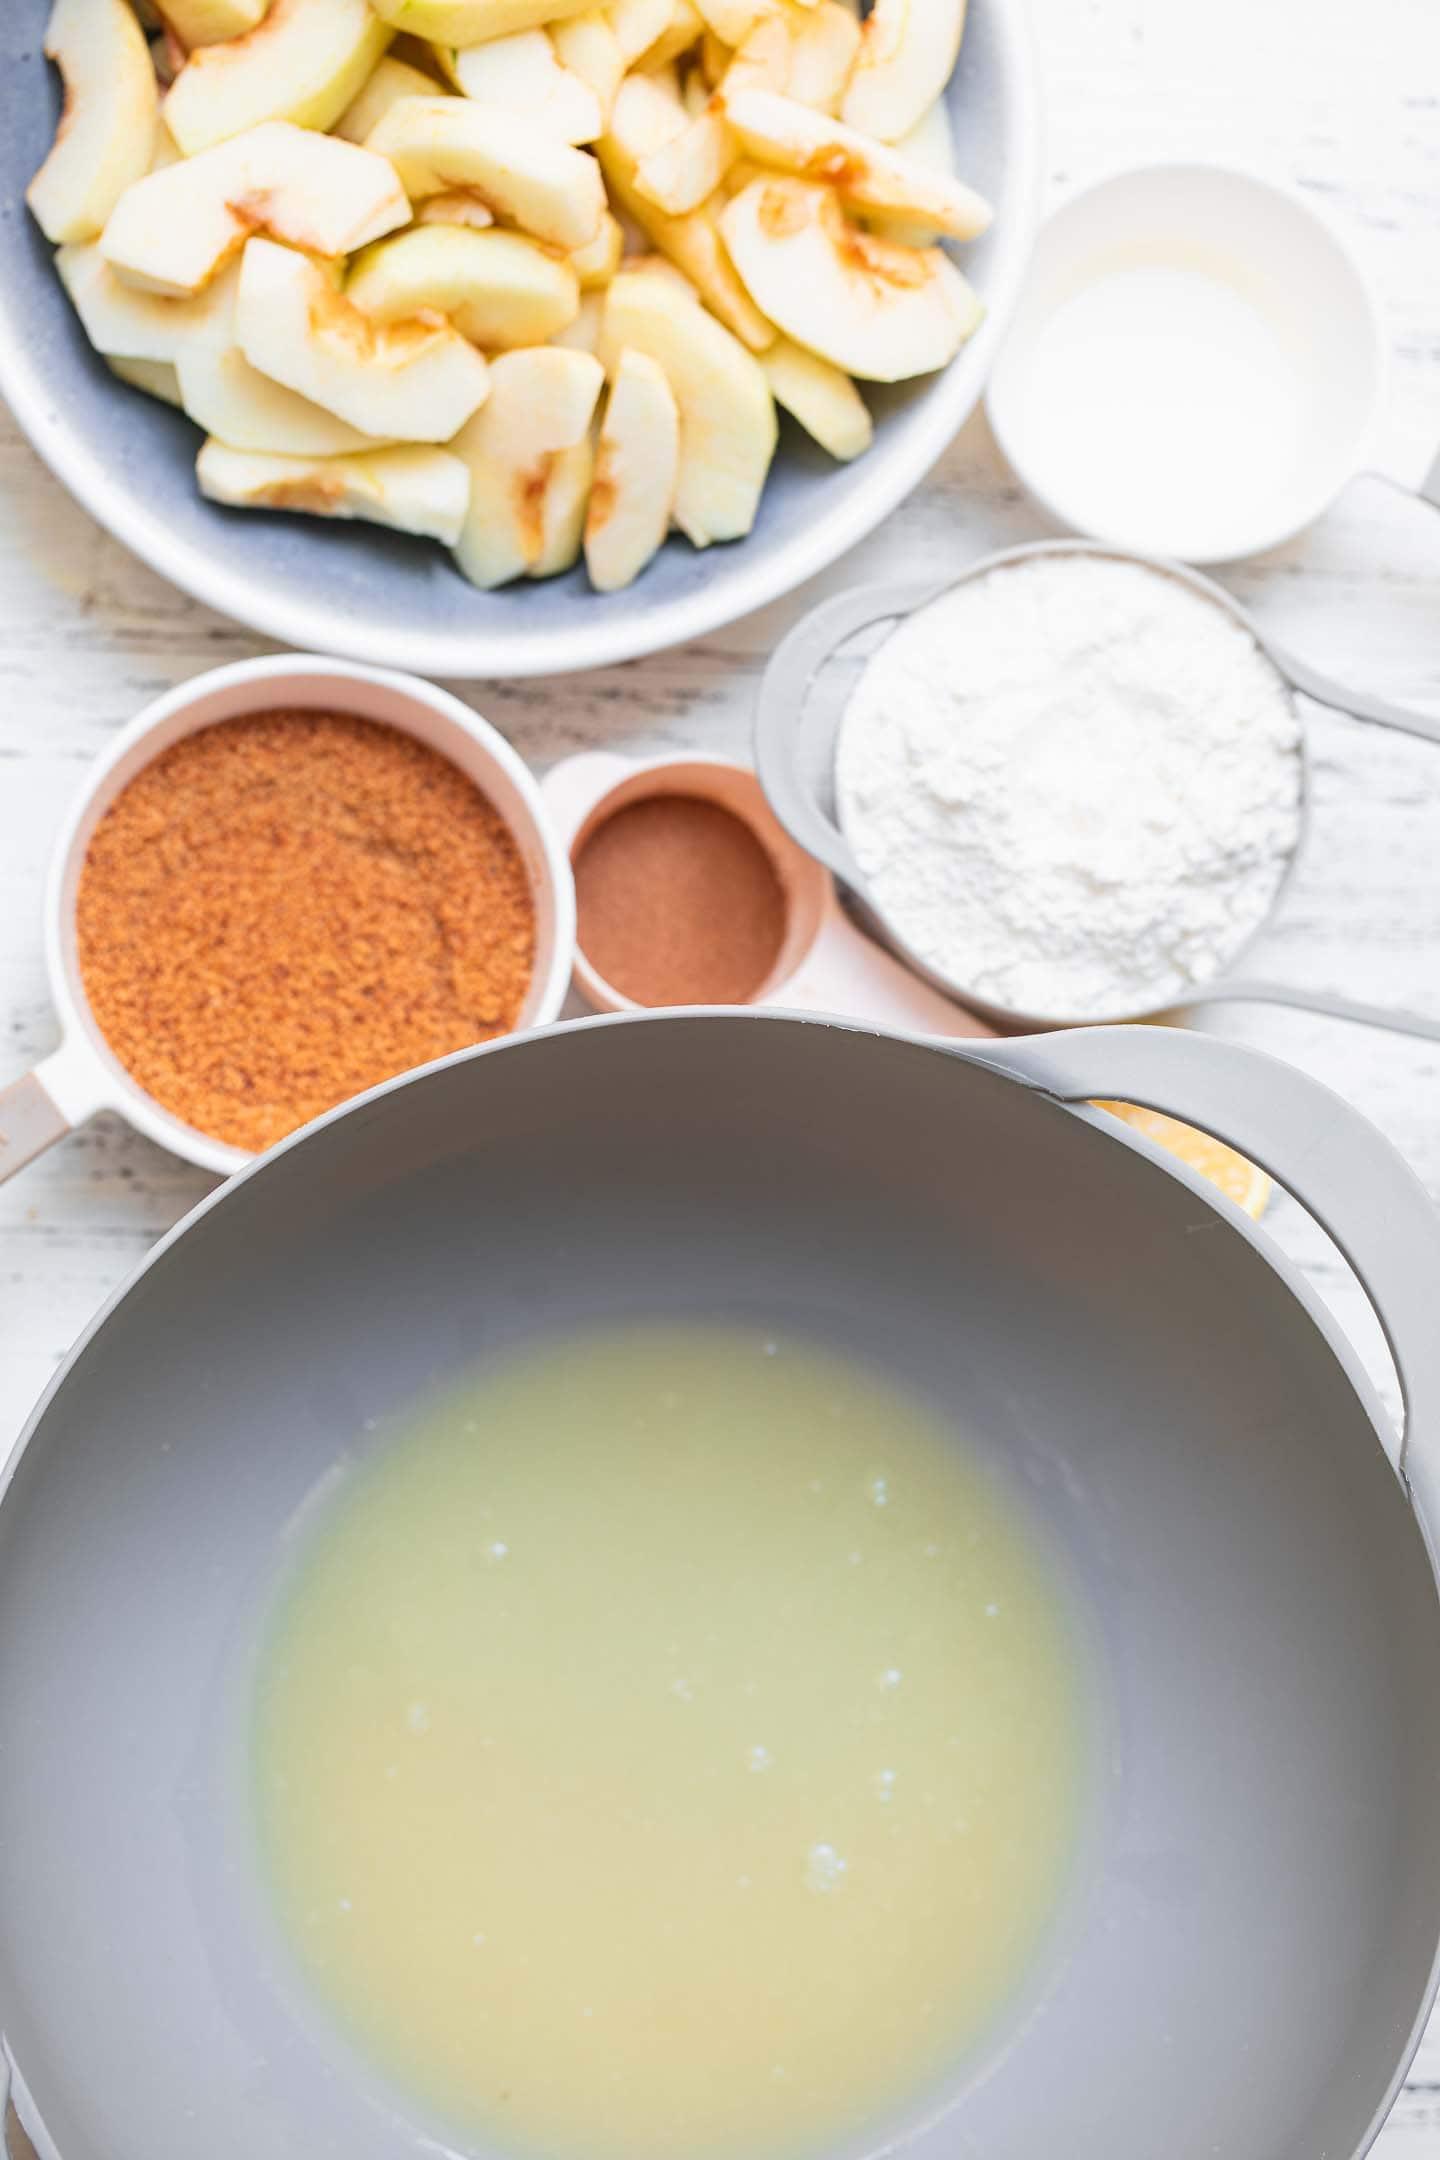 Ingredients for a gluten-free vegan apple cake